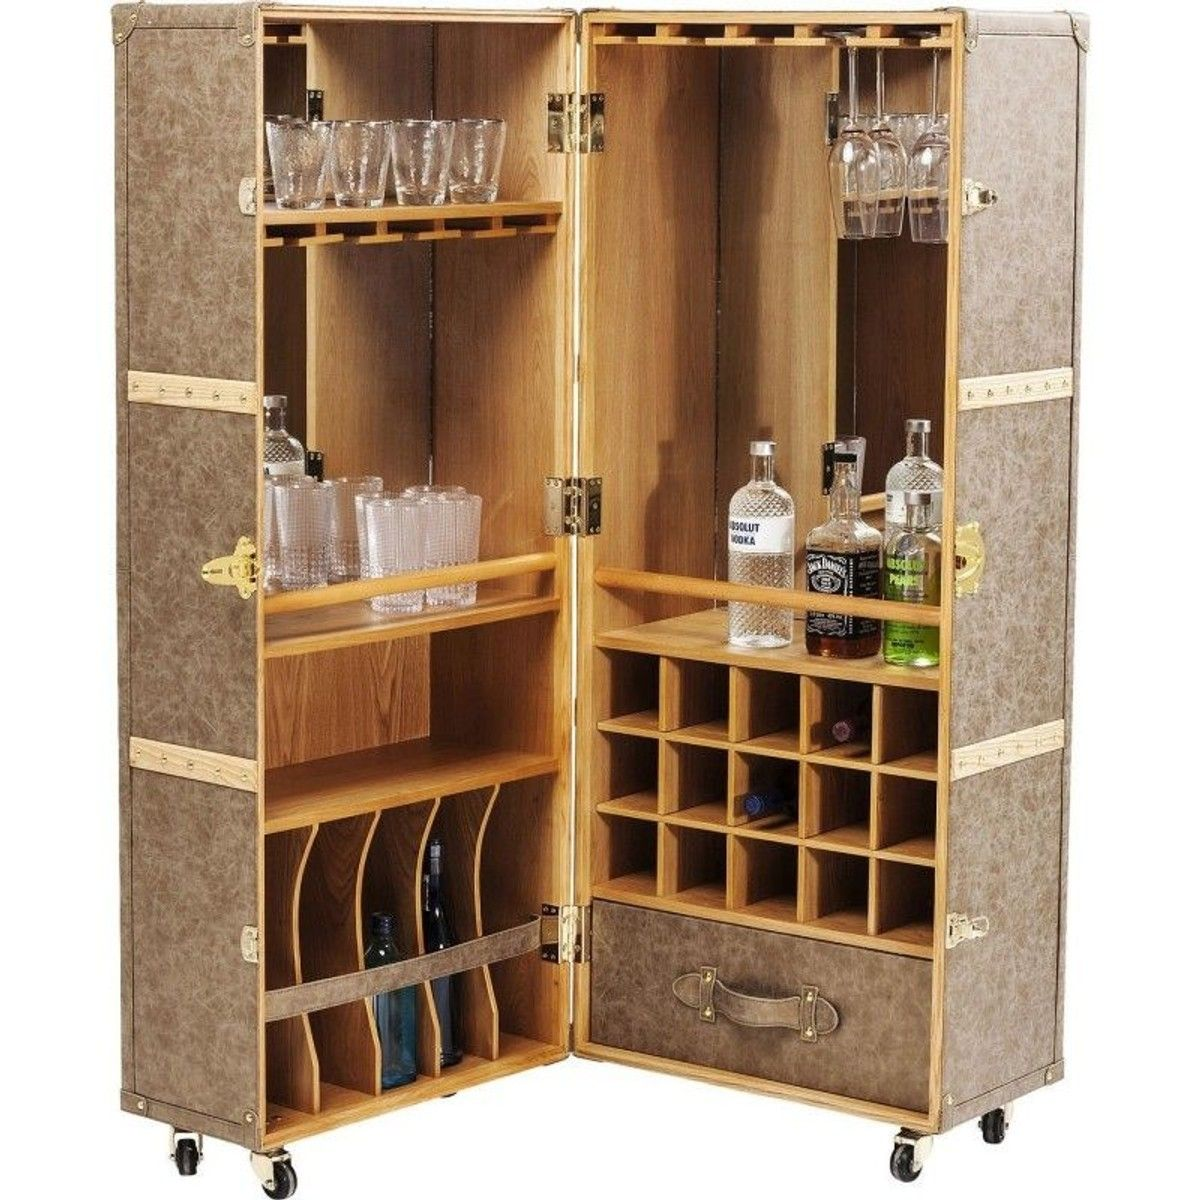 Bar Coffre West Coast Kare Design Taille Tu Meuble Bar Armoire A Vin Mobilier De Bar